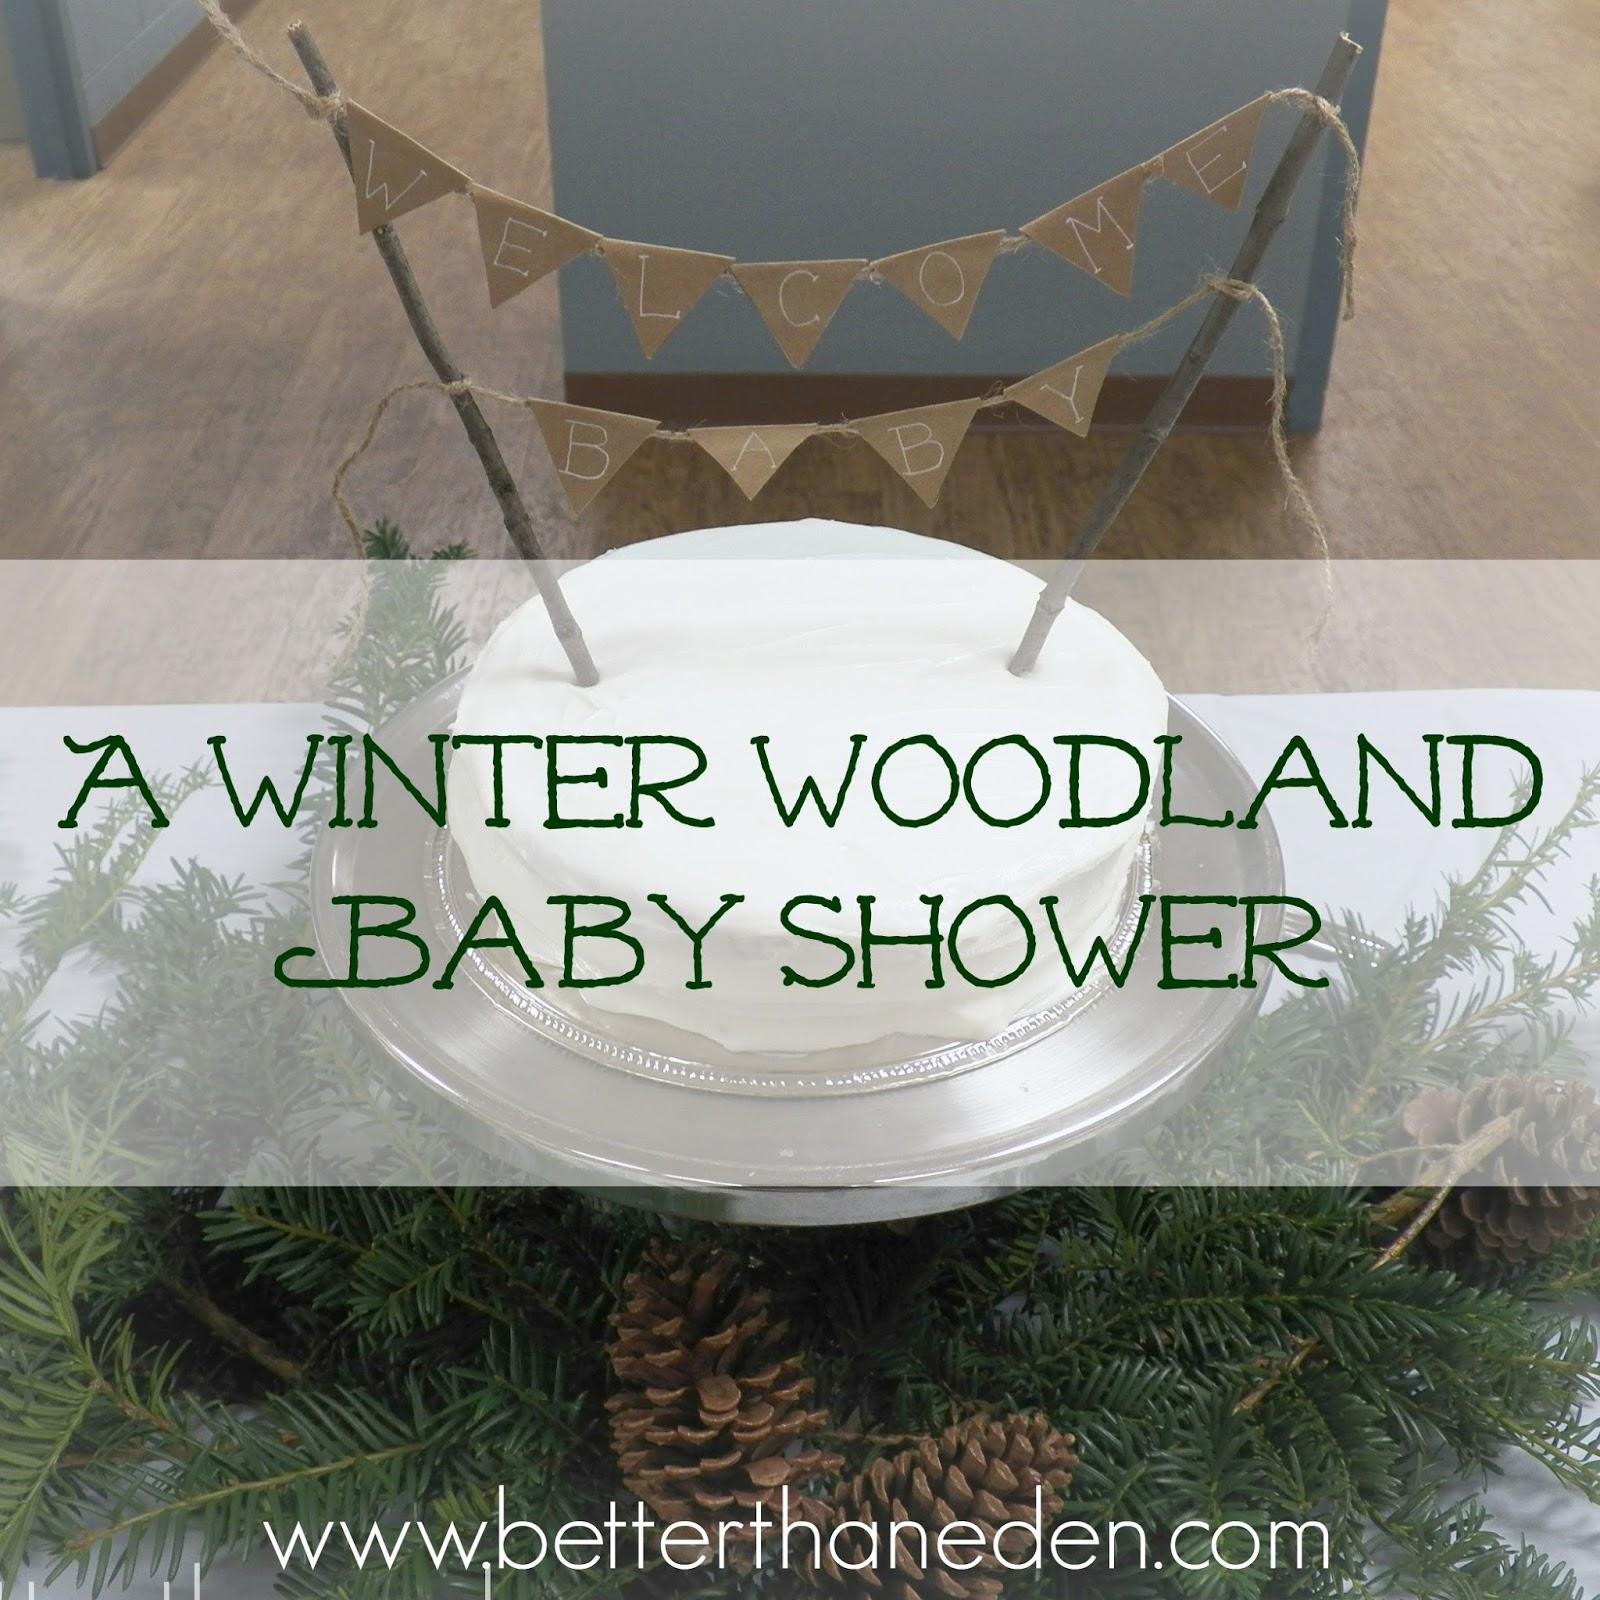 Winter Woodland Baby Shower